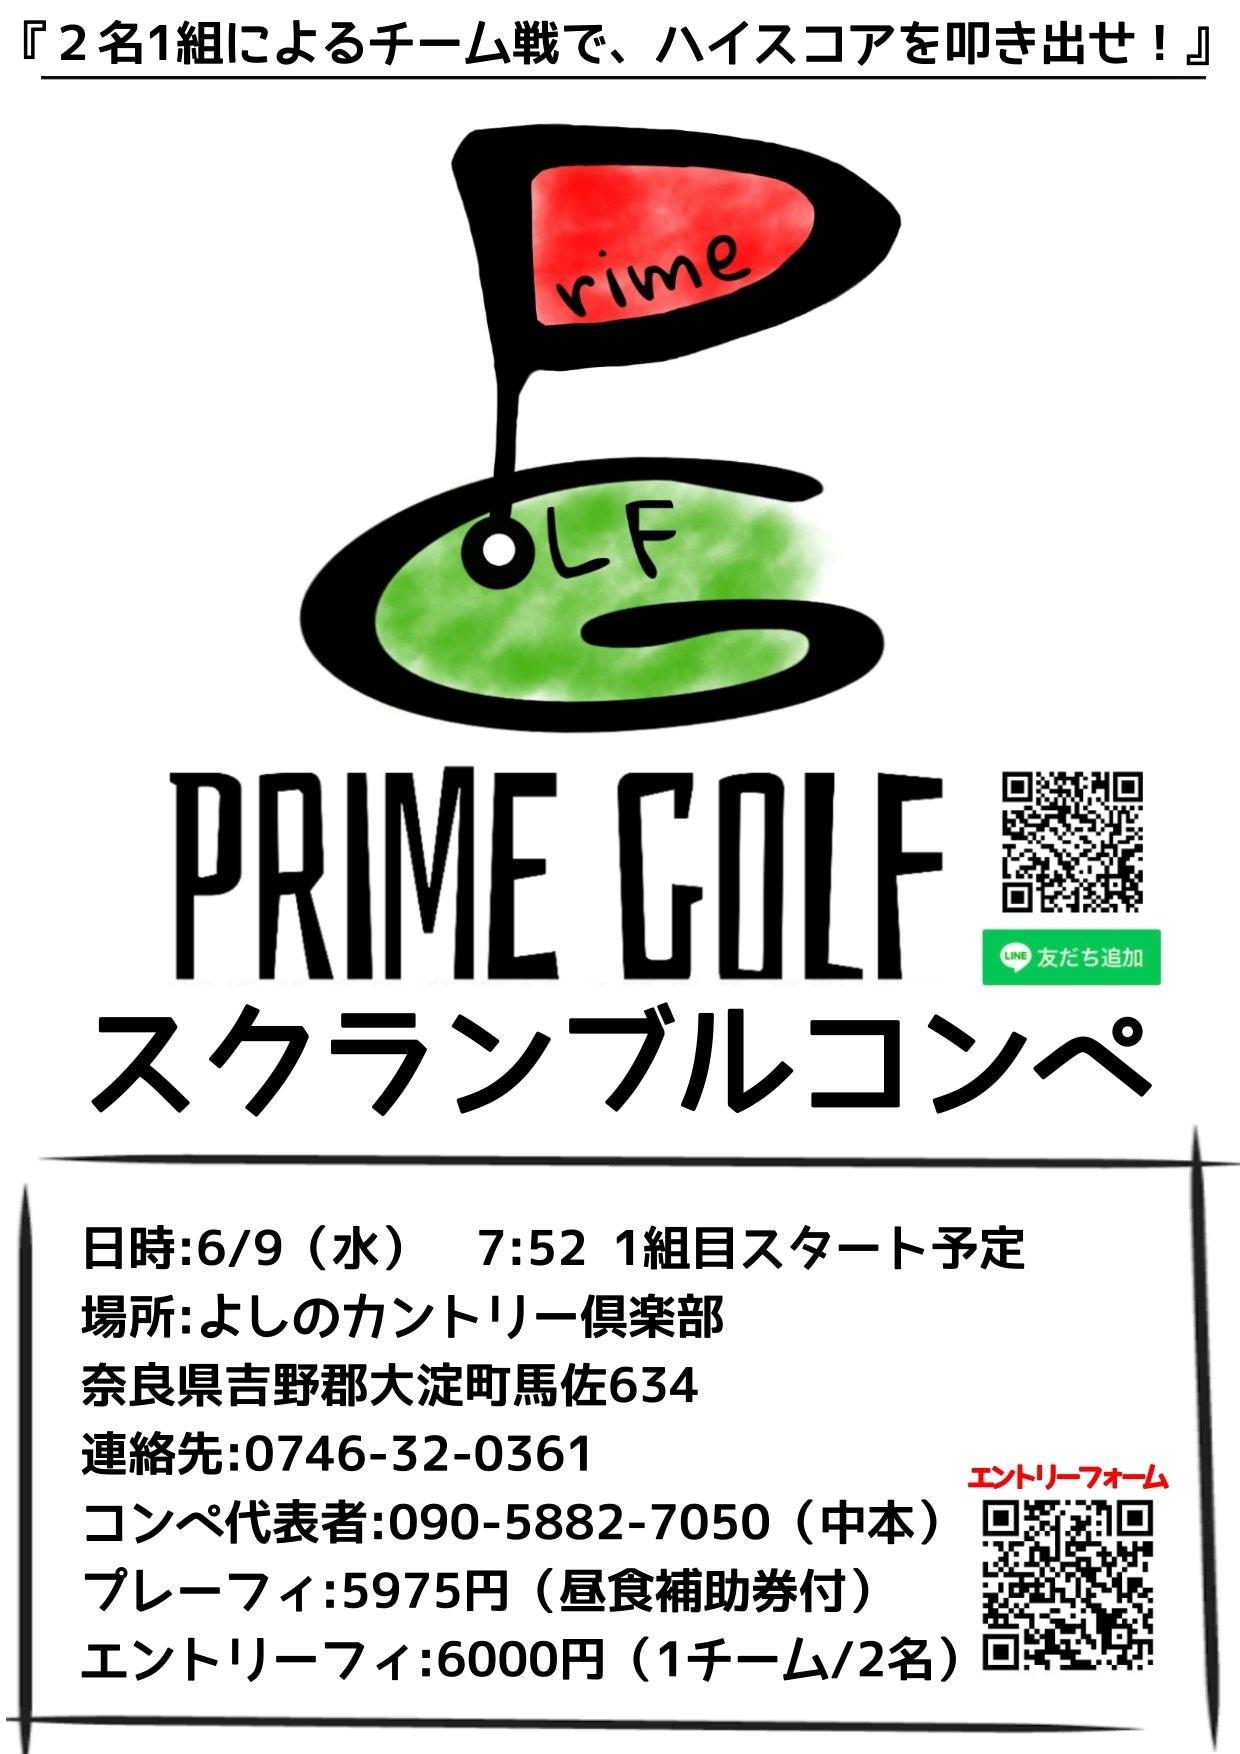 PRIME GOLF 『6月9日 よしのカントリー倶楽部 エントリーチケット 2名様分』のイメージその2